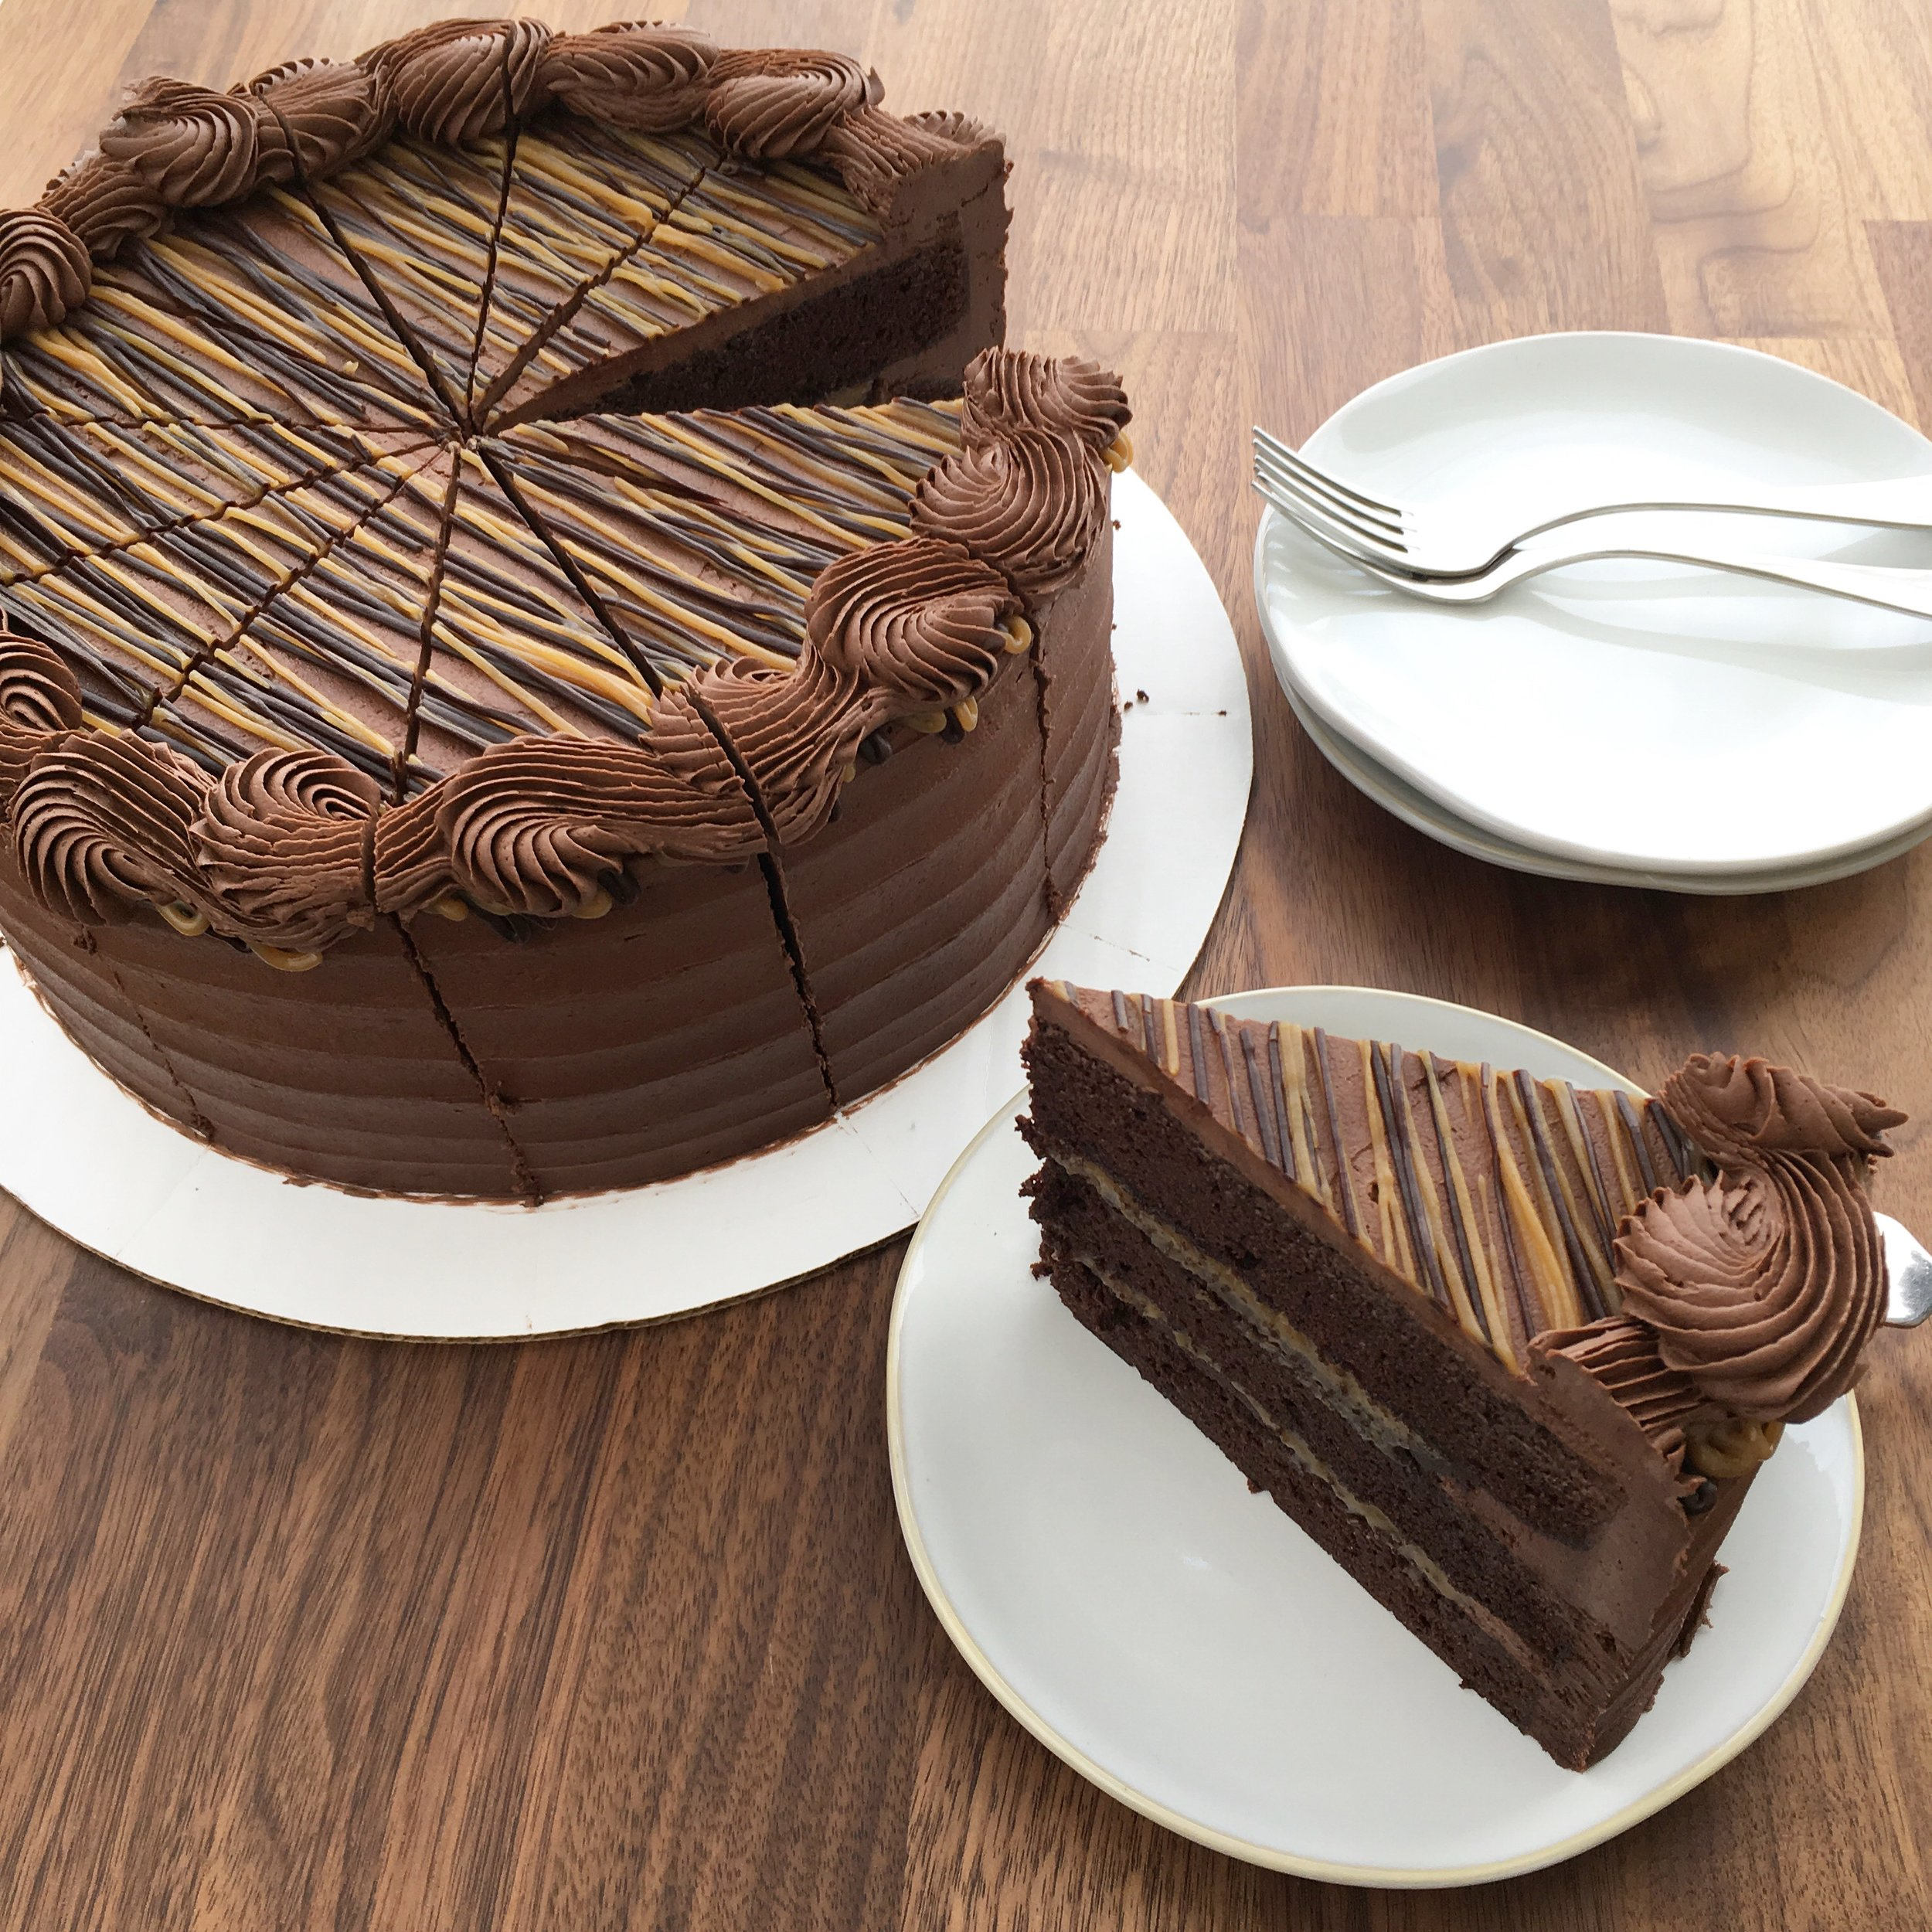 Vegan Chocolate & Caramel Cake Retail.jpg